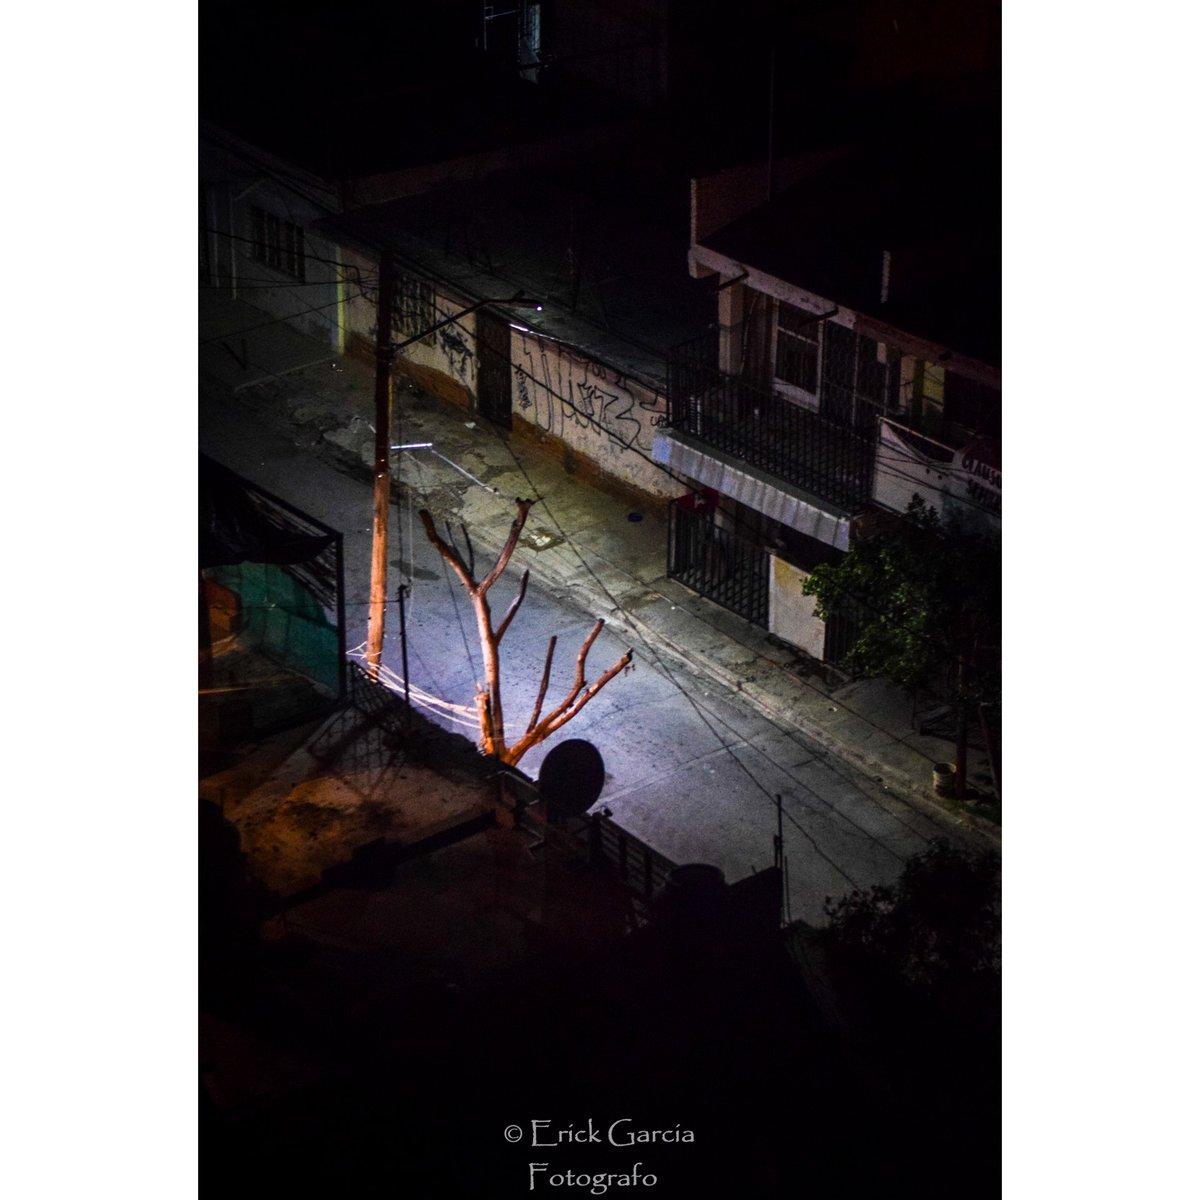 El barrio. . . . . . . #nature #nikon #nikonmexico #talentomexicano #mexico #photography #photo #mexicofotos #capturamexico #visitmexico #nationalgeographic #worldplaces #mx #fotografomazatlan #discoverychannel #erickgarciafotografia #mazatlan #sinaloa #hechoenmexico